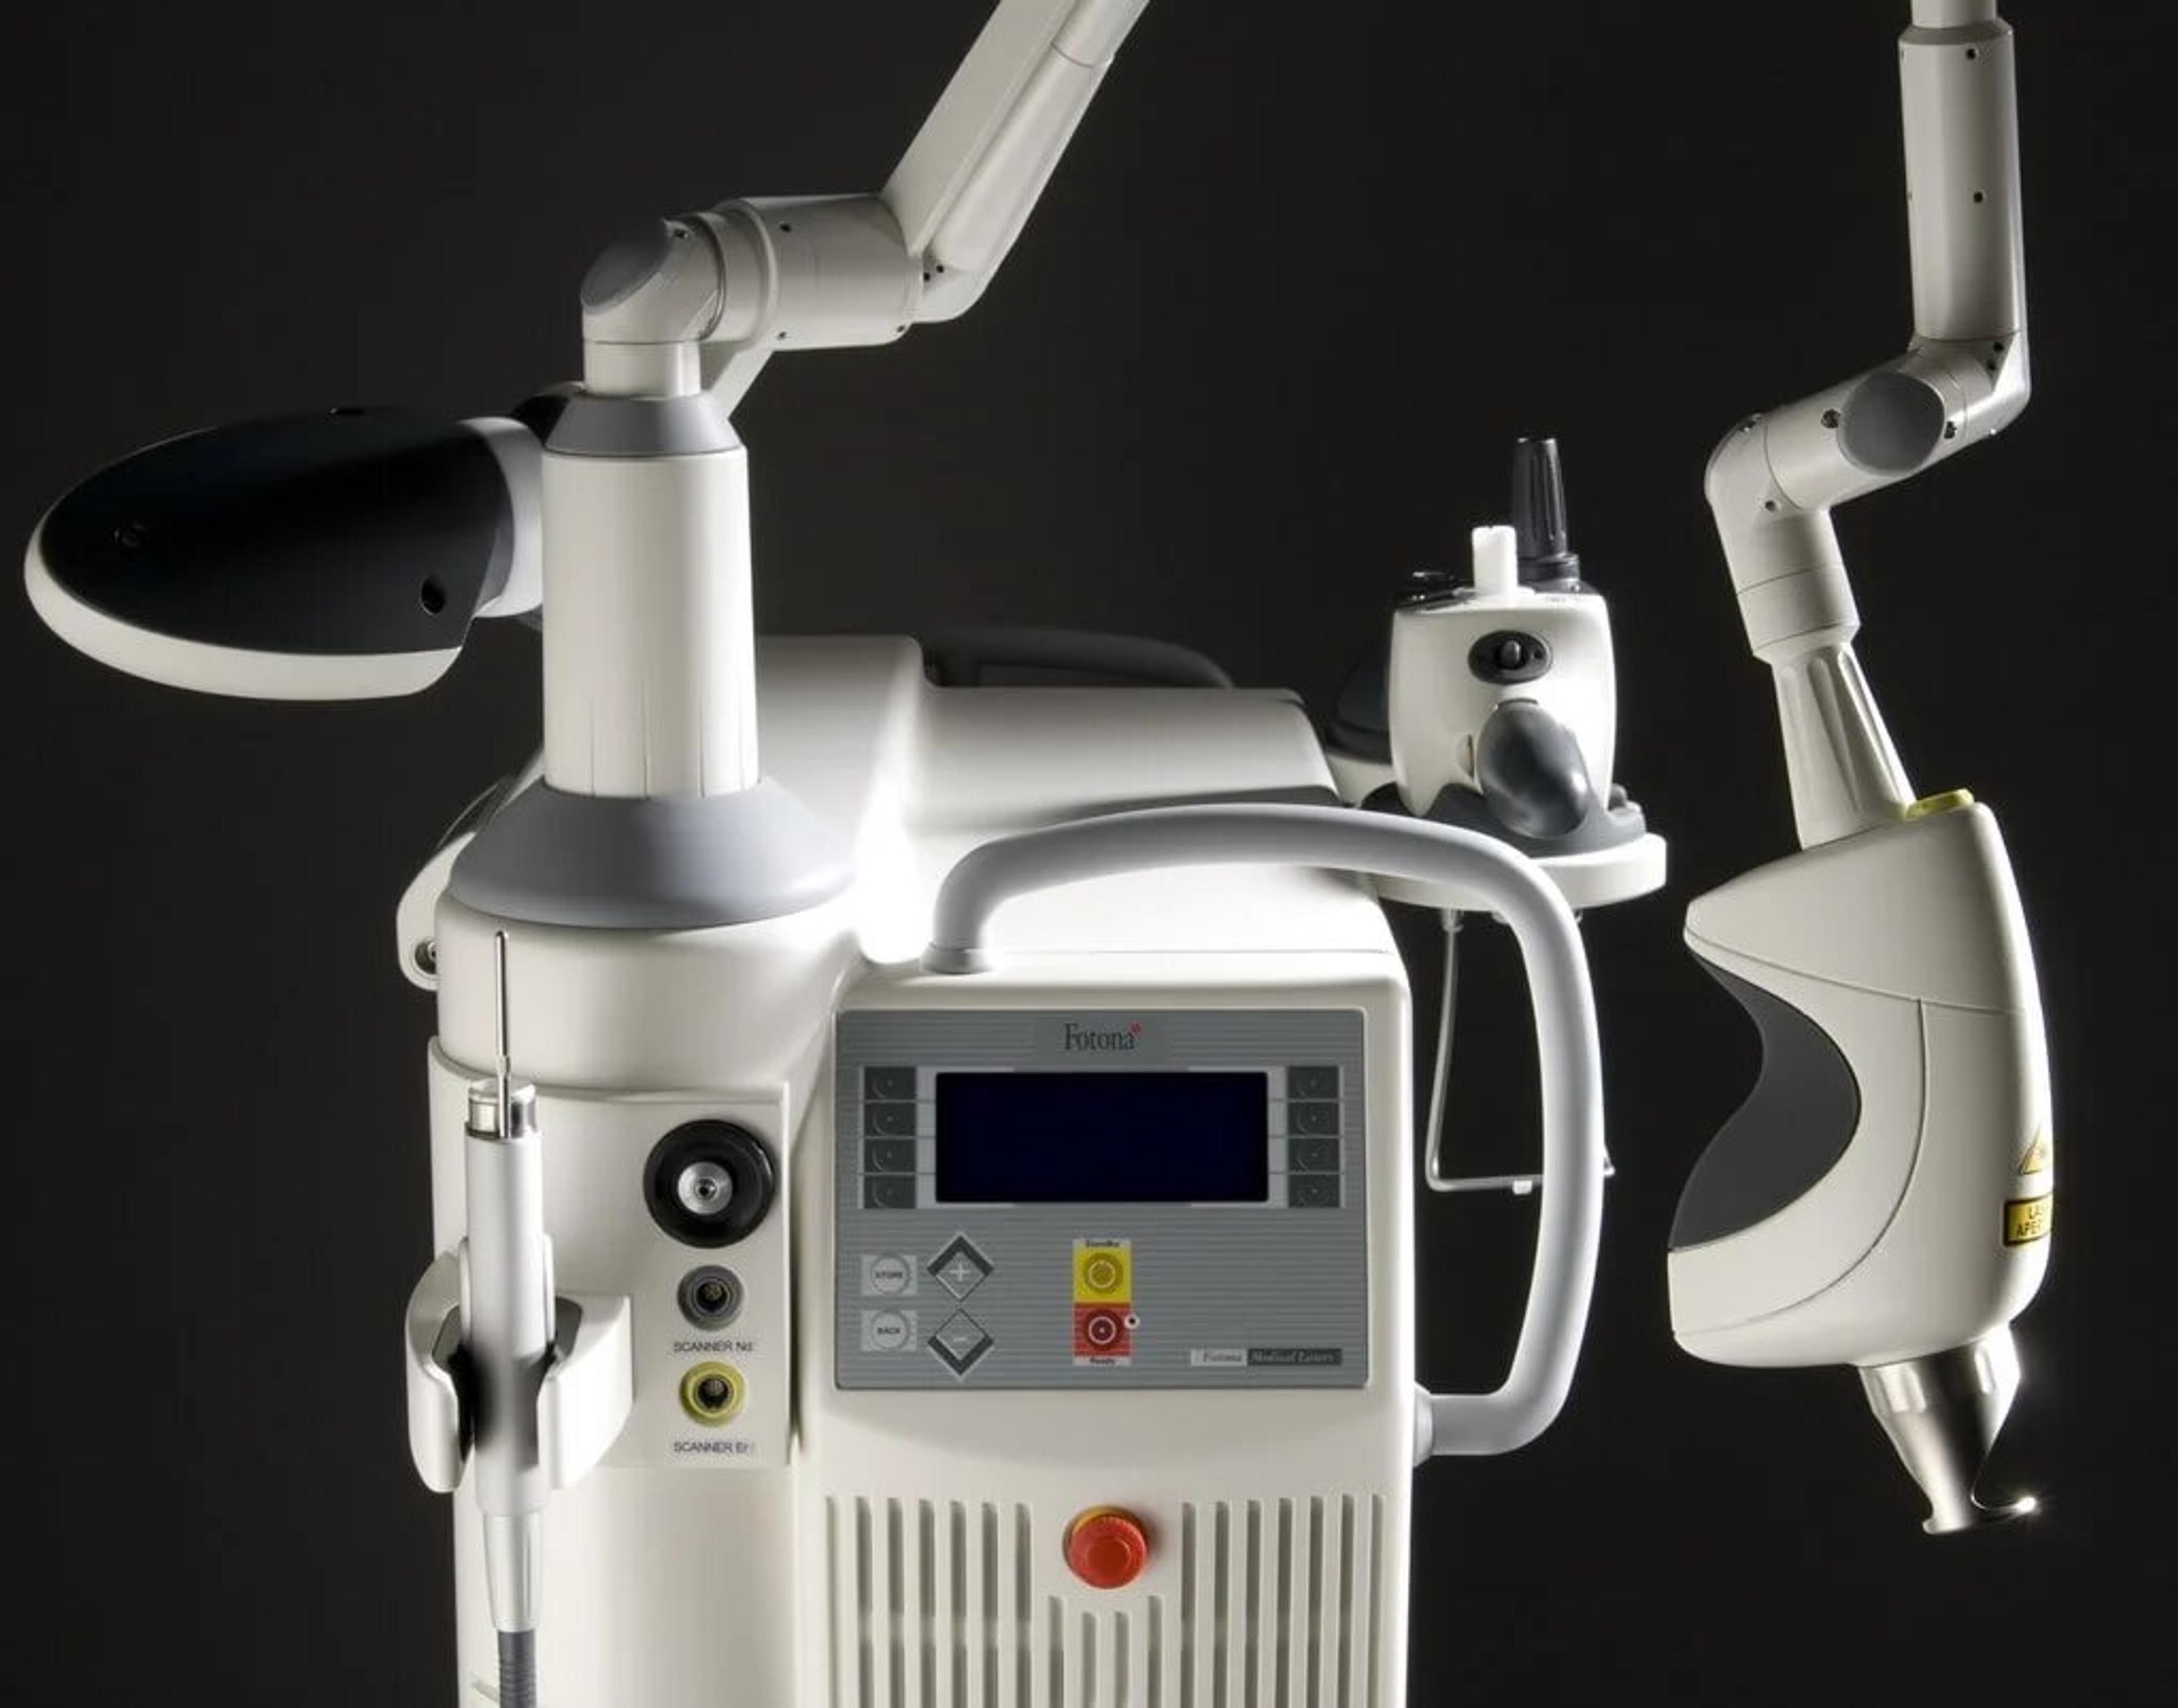 Fotona 4D Machine